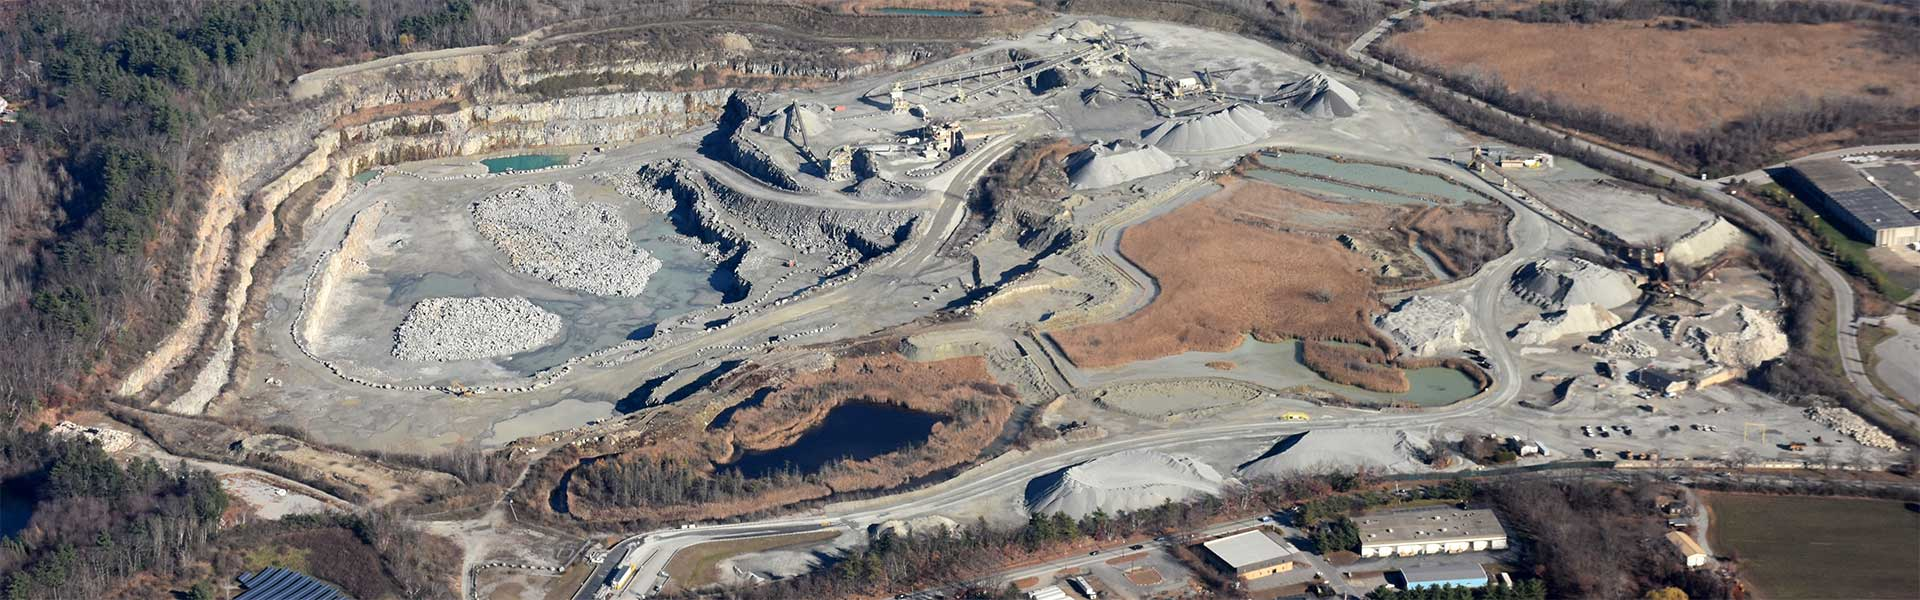 aggregate mining